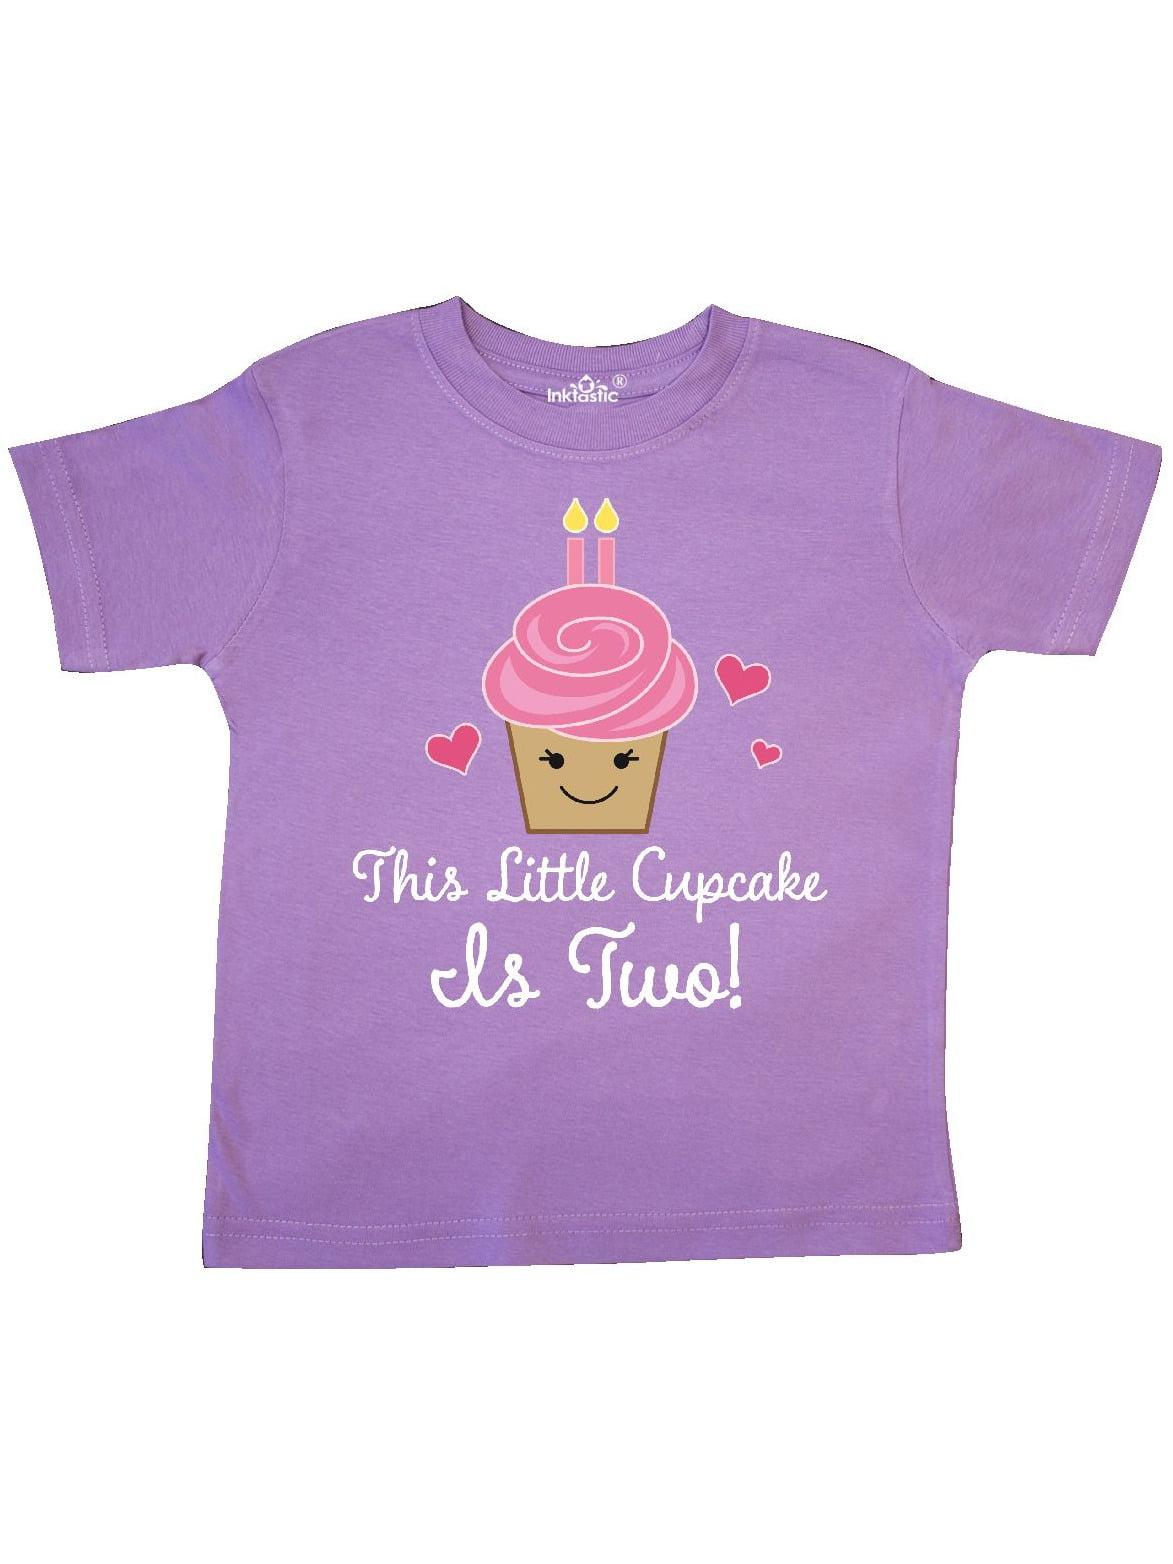 2nd Birthday Cupcake Girls Cute Toddler T-Shirt